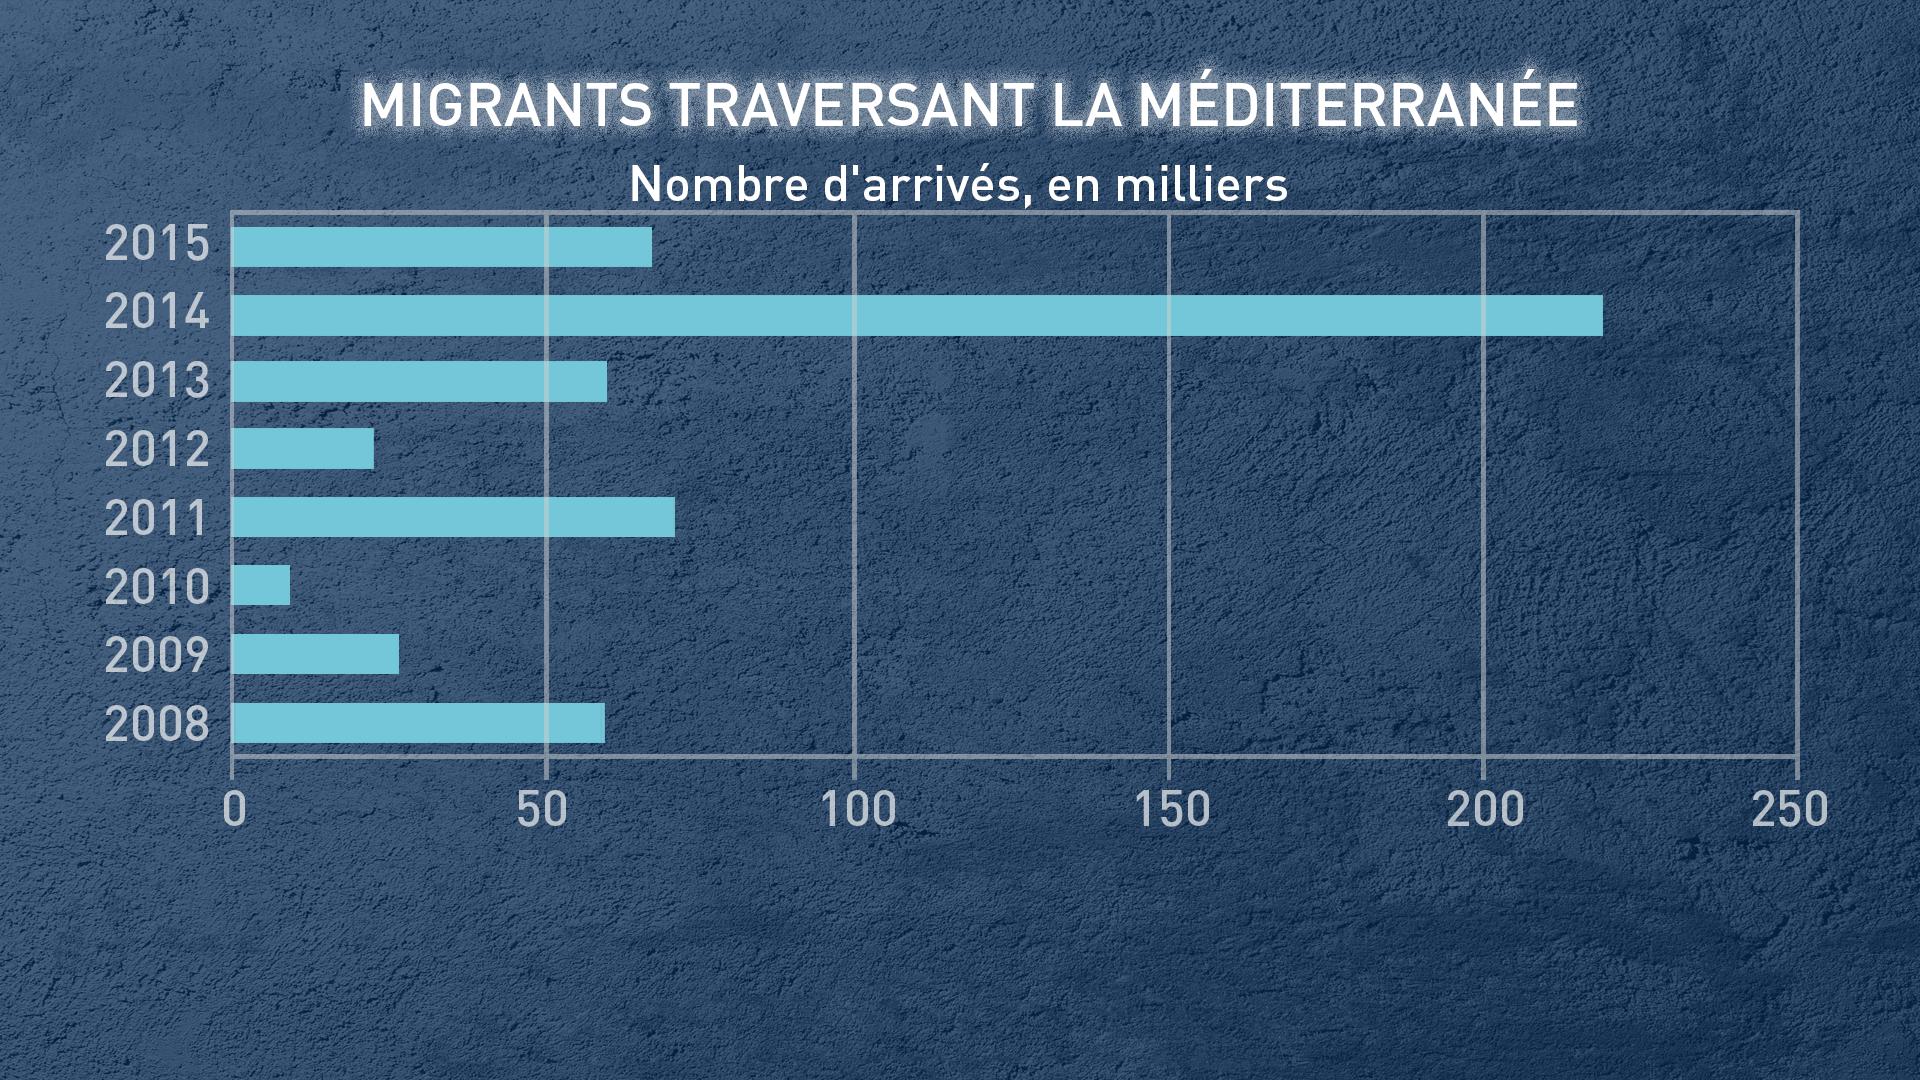 Migrants traversant la Méditerranée